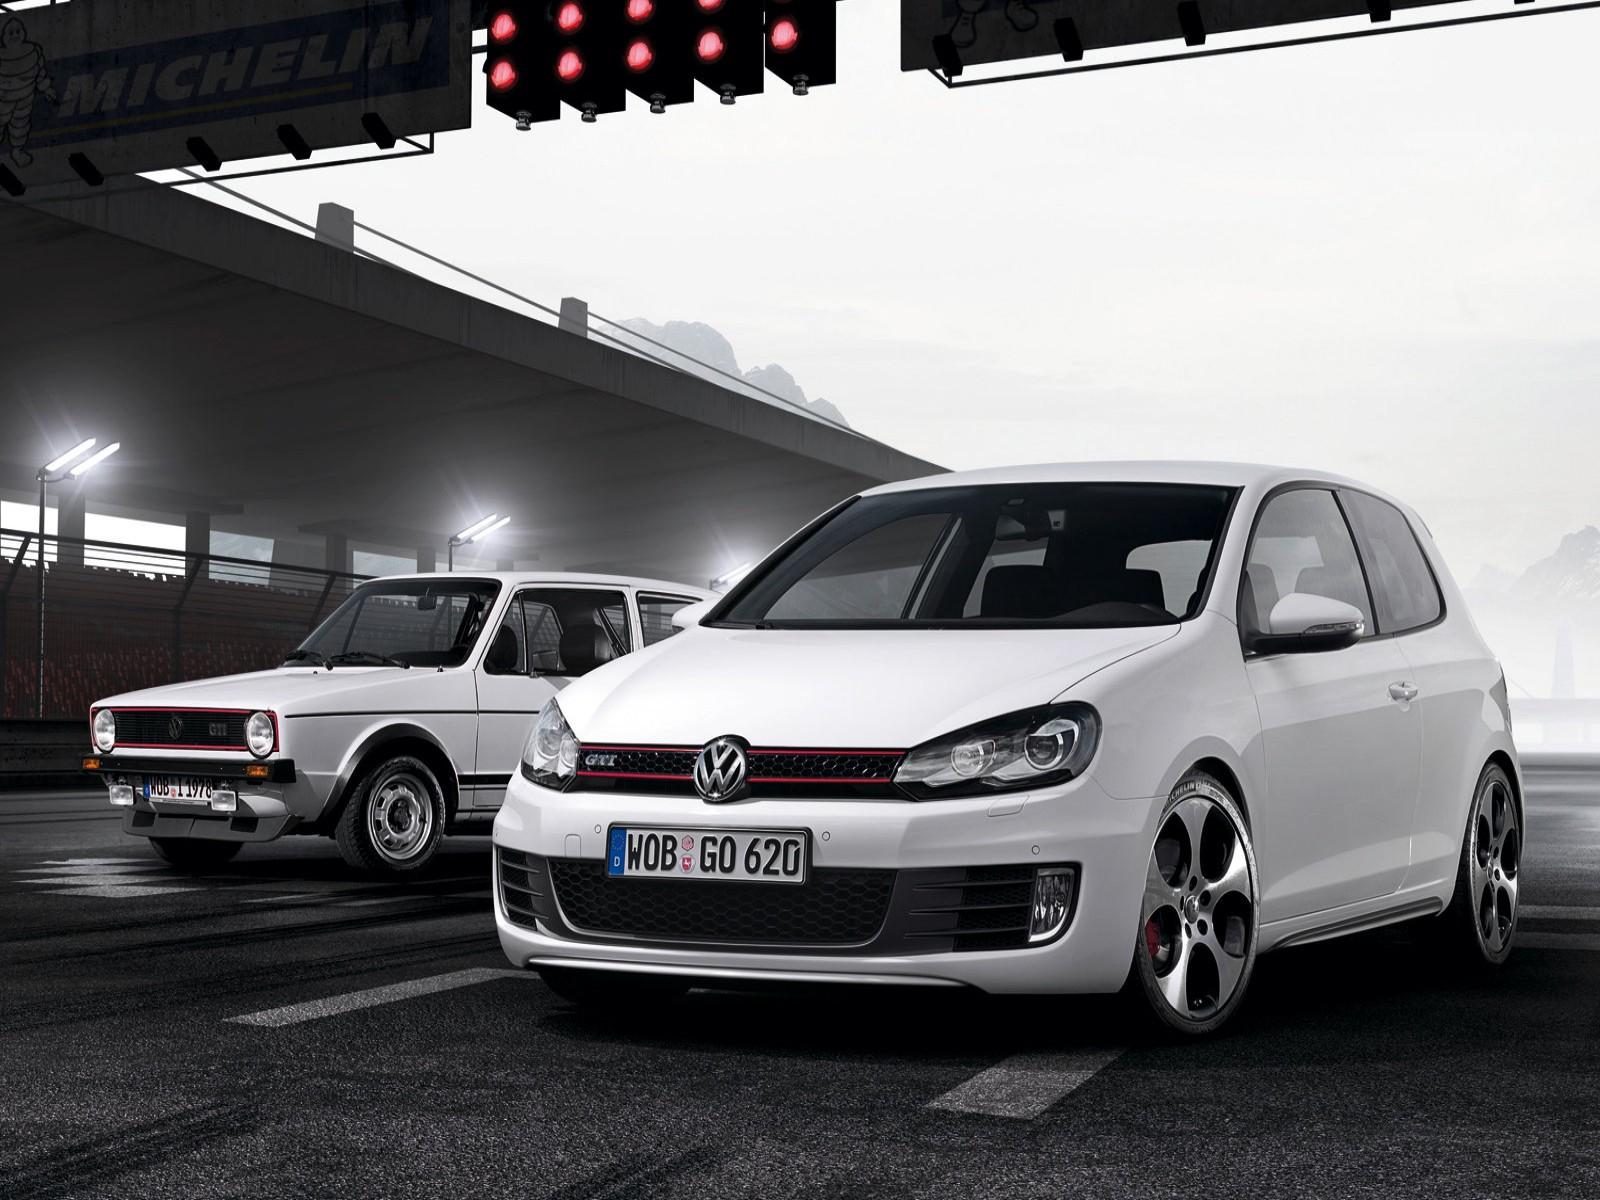 Volkswagen Golf GTI Concept Free Download Image Of